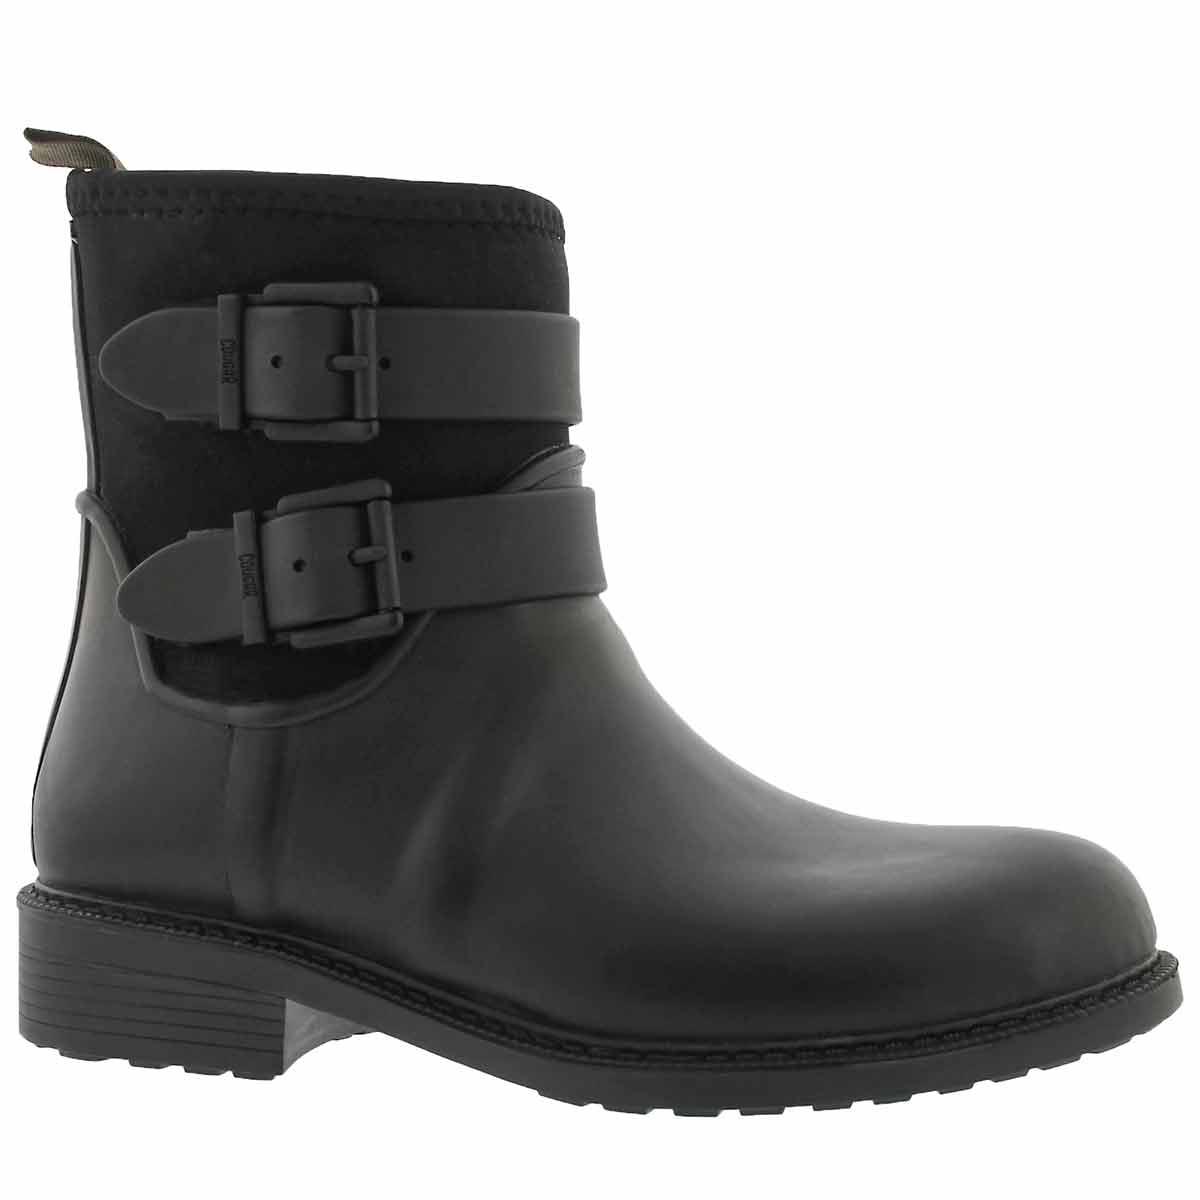 Women's KISMET black waterproof rain boots